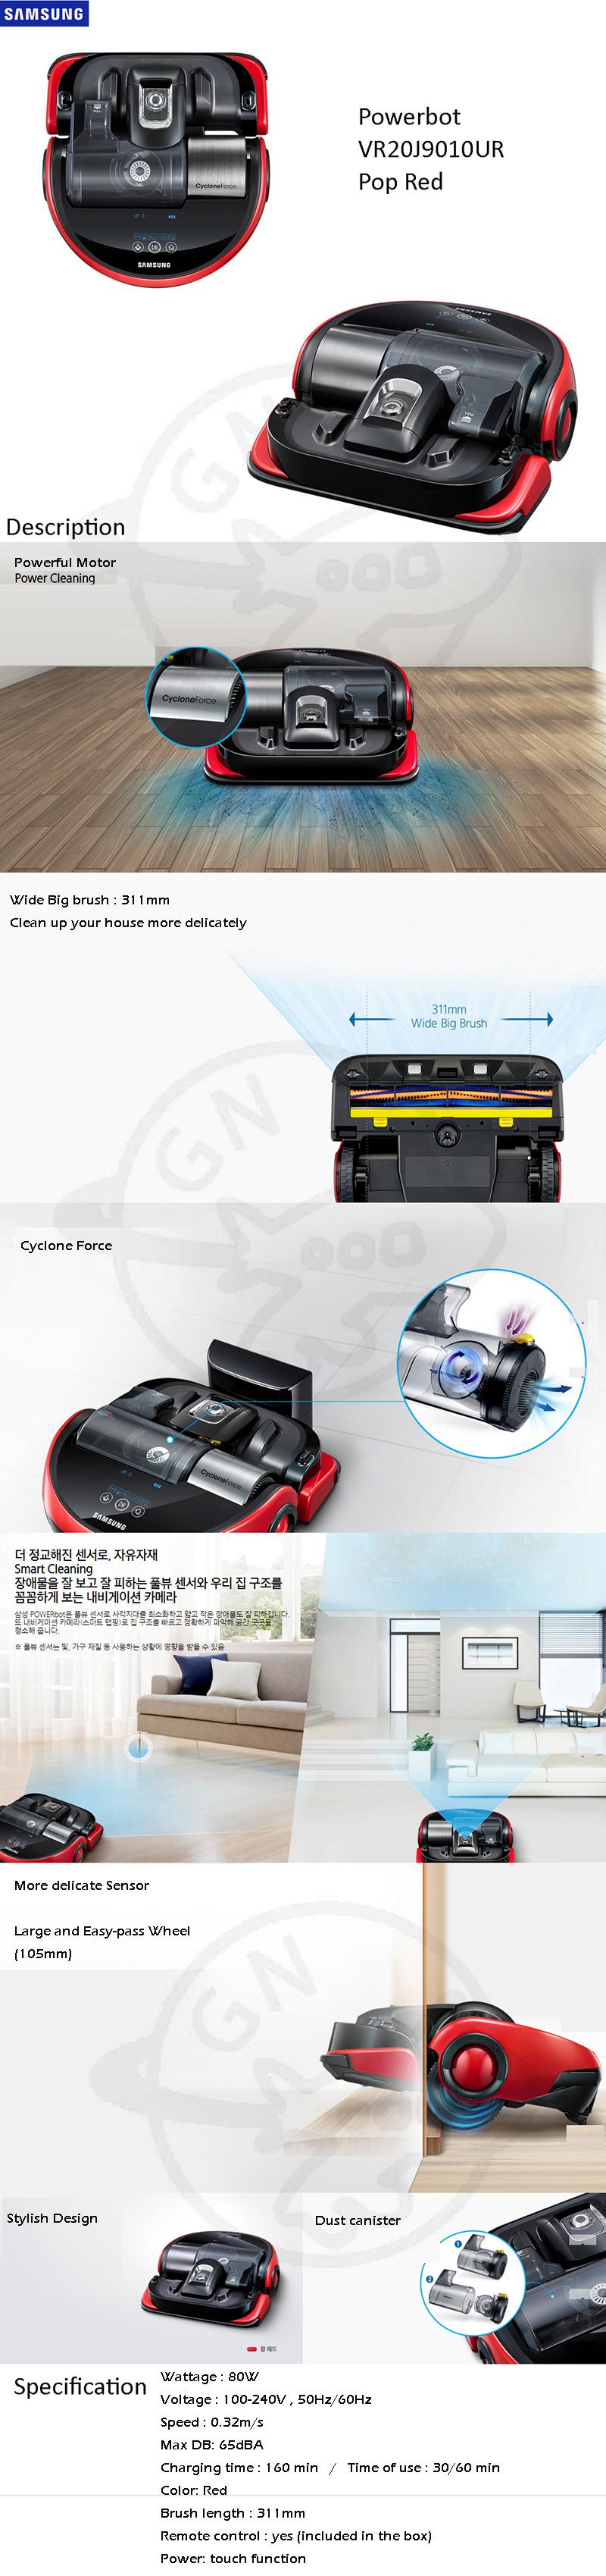 samsung cyclone force vacuum manual